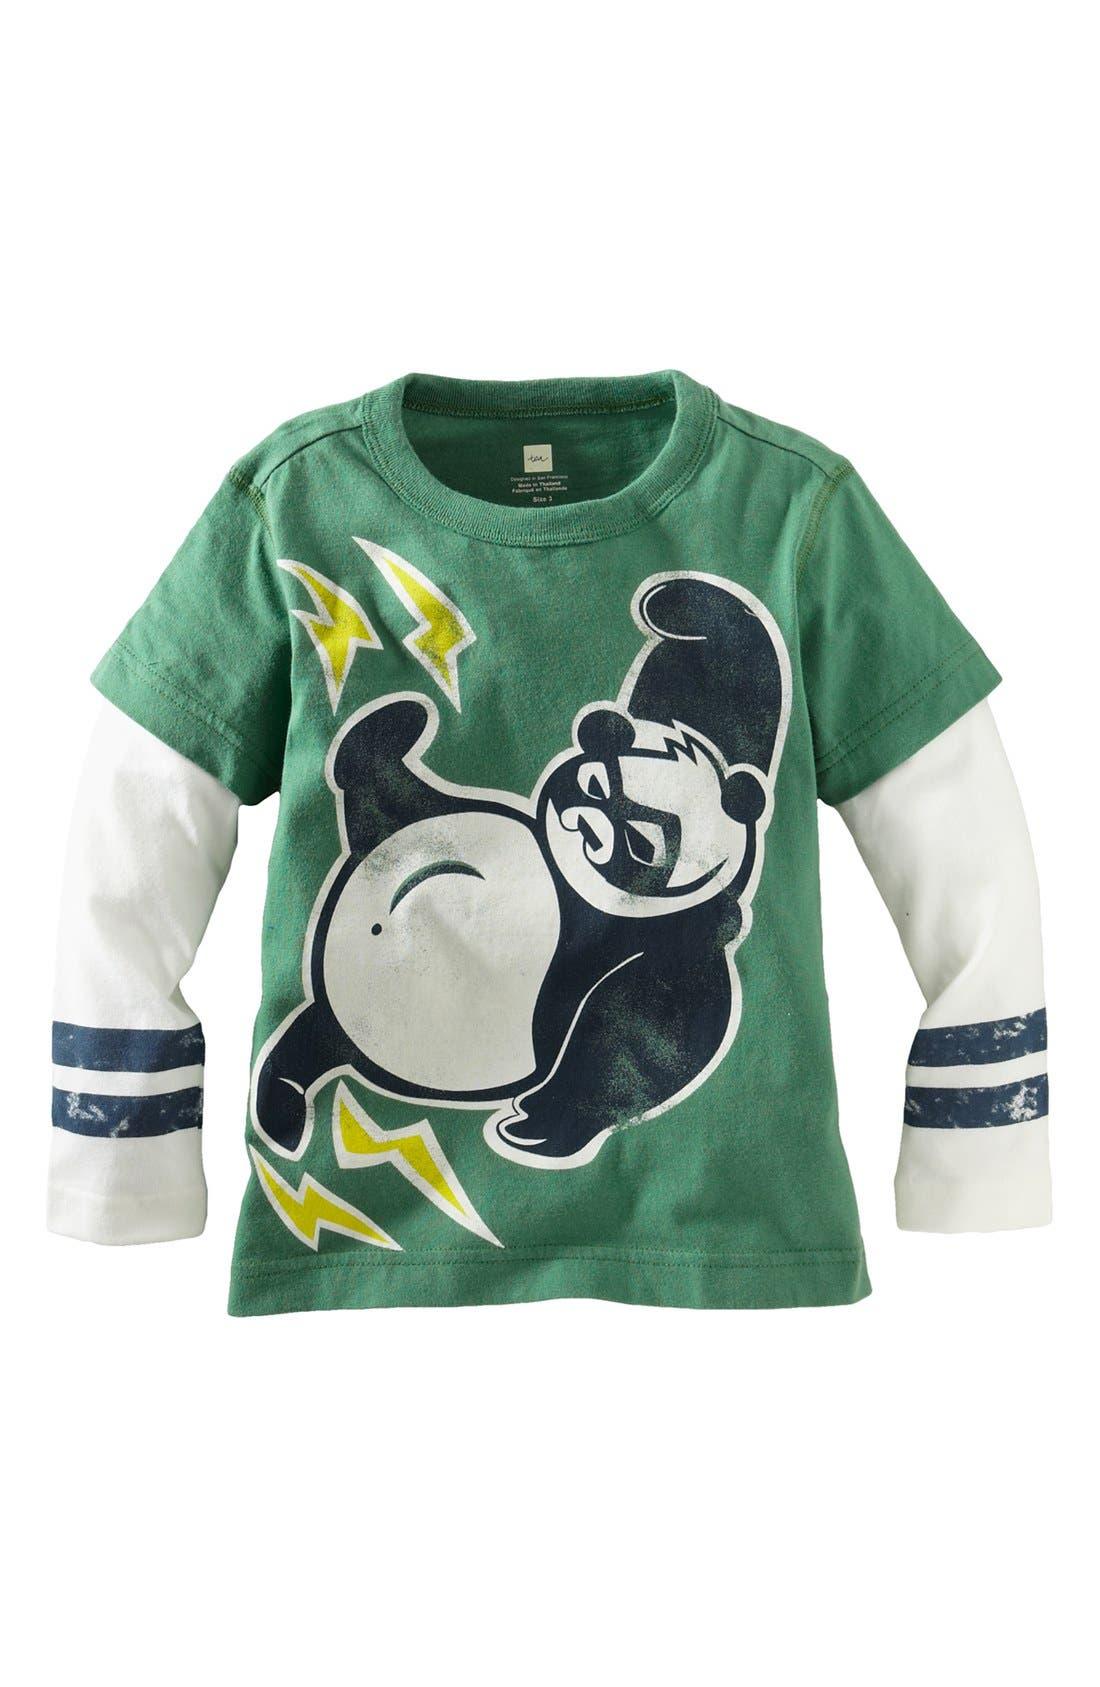 Alternate Image 1 Selected - Tea Collection 'Super Panda Double Decker' T-Shirt (Toddler Boys)